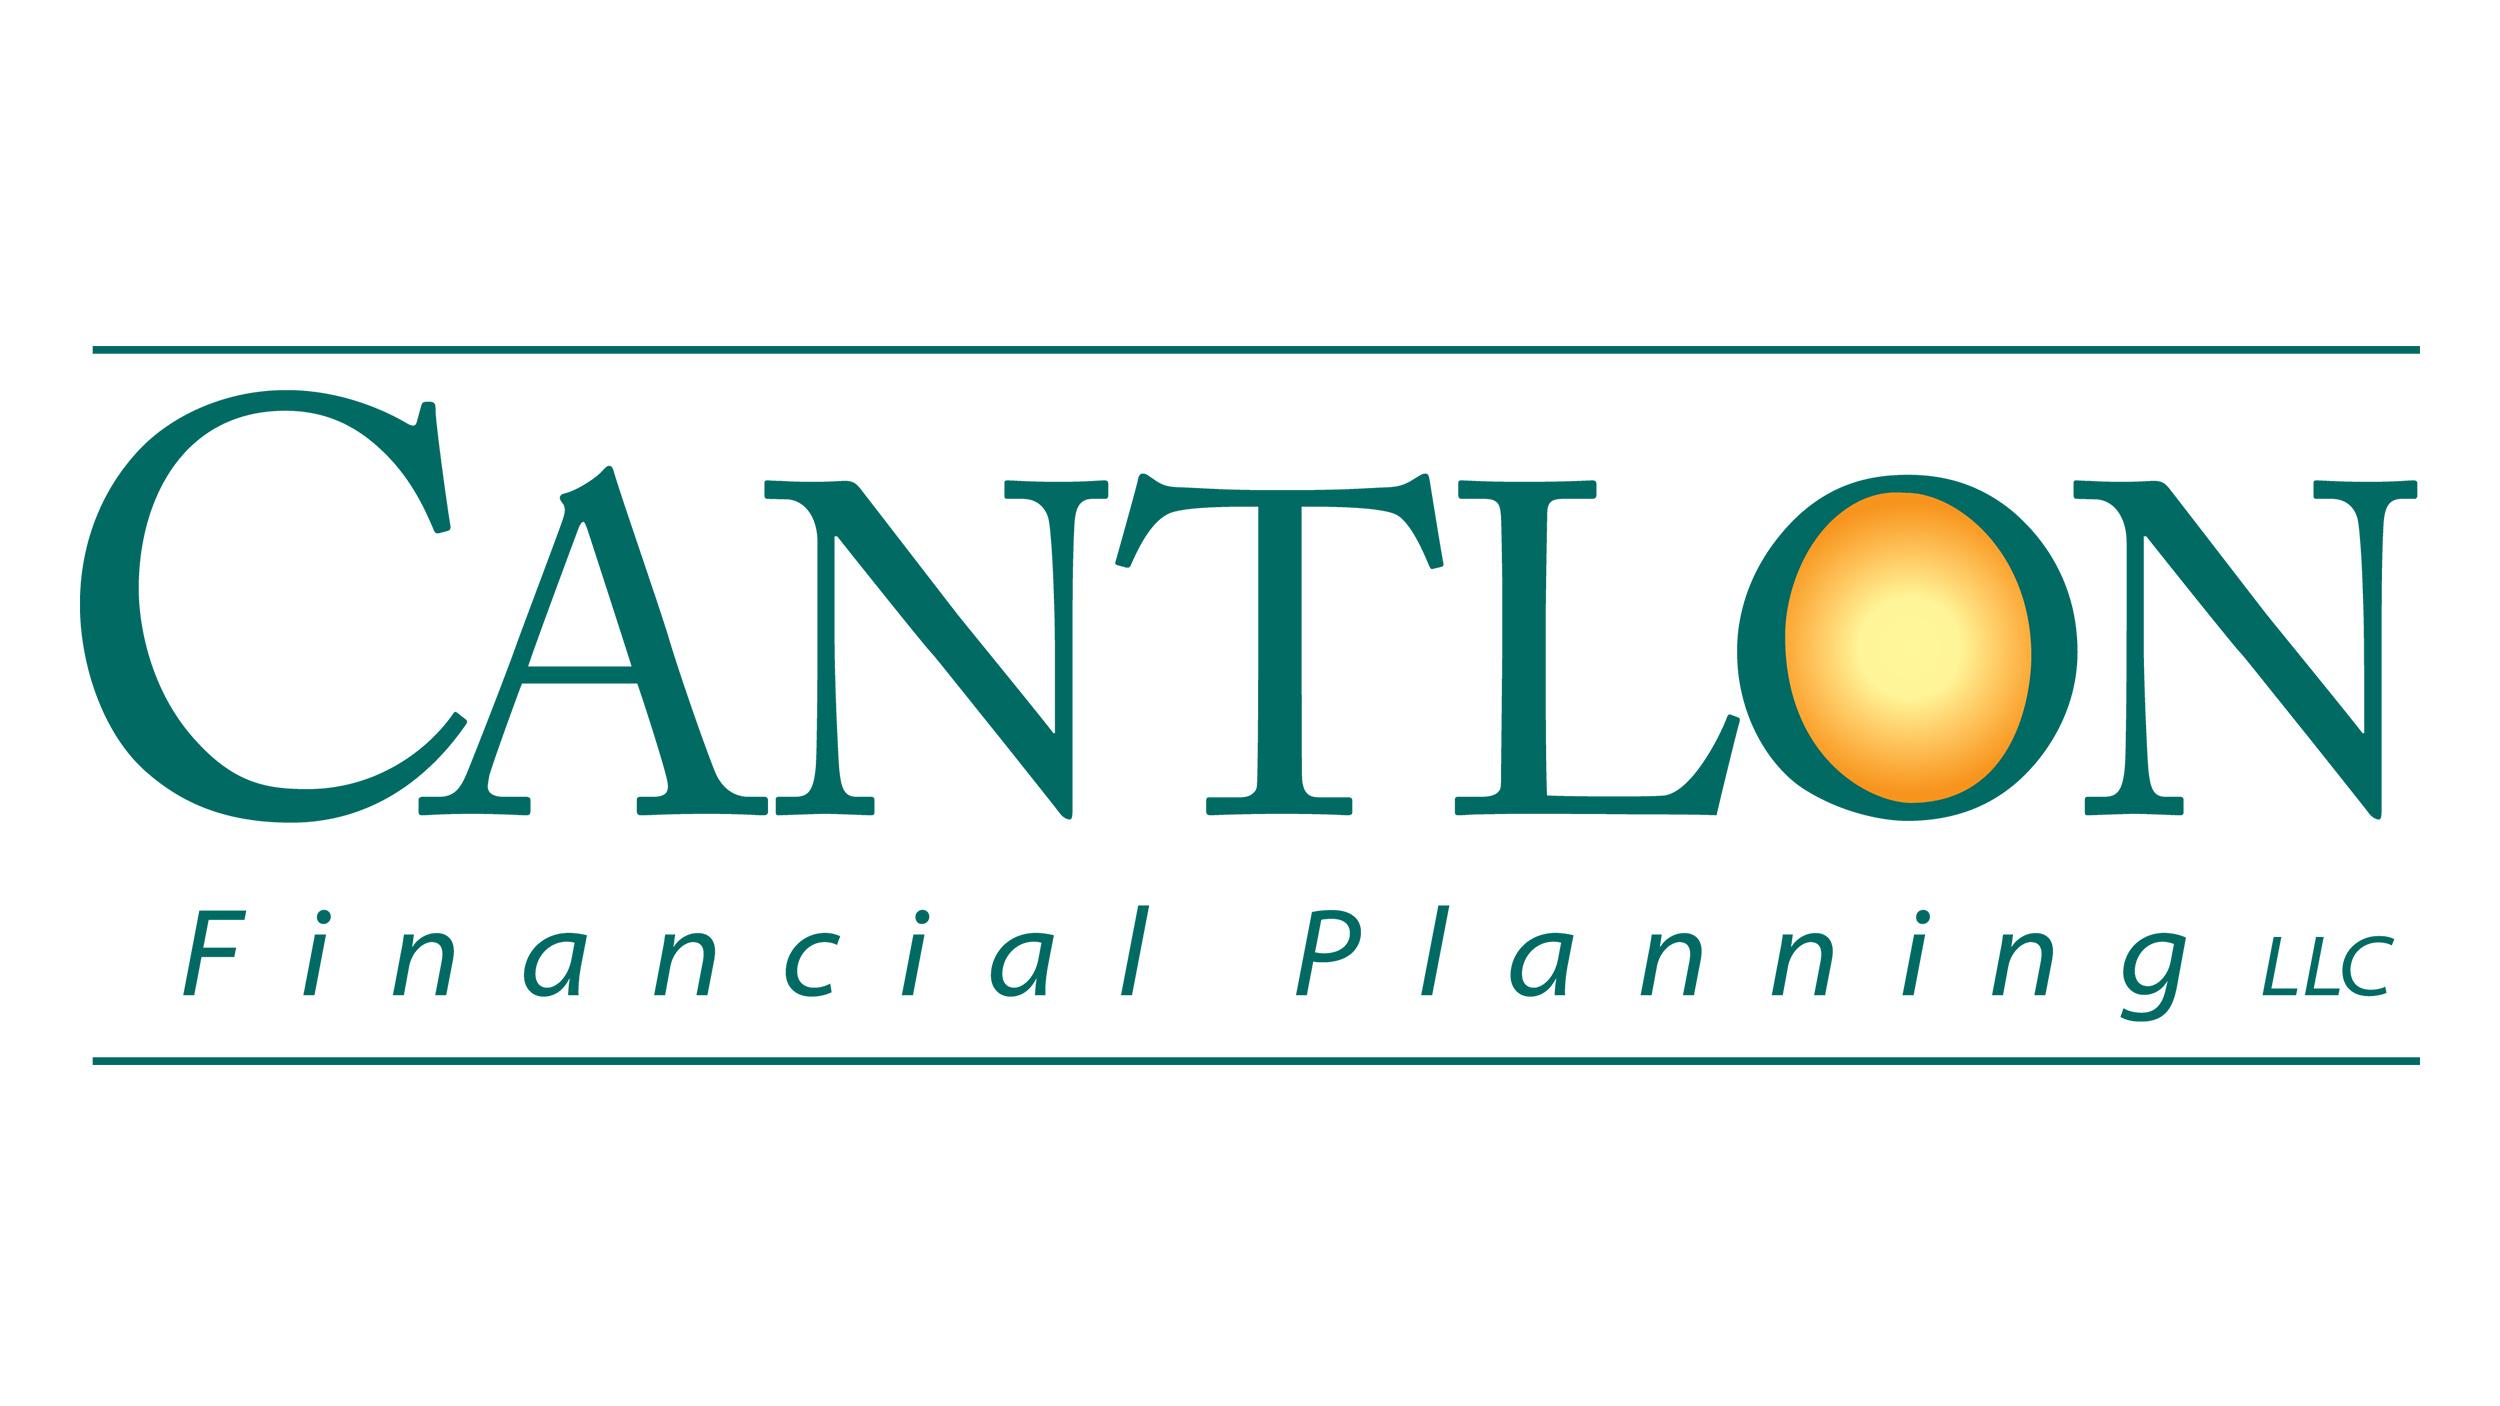 Cantlon-Financial-Planning-Logos-Brand-Identity.jpg